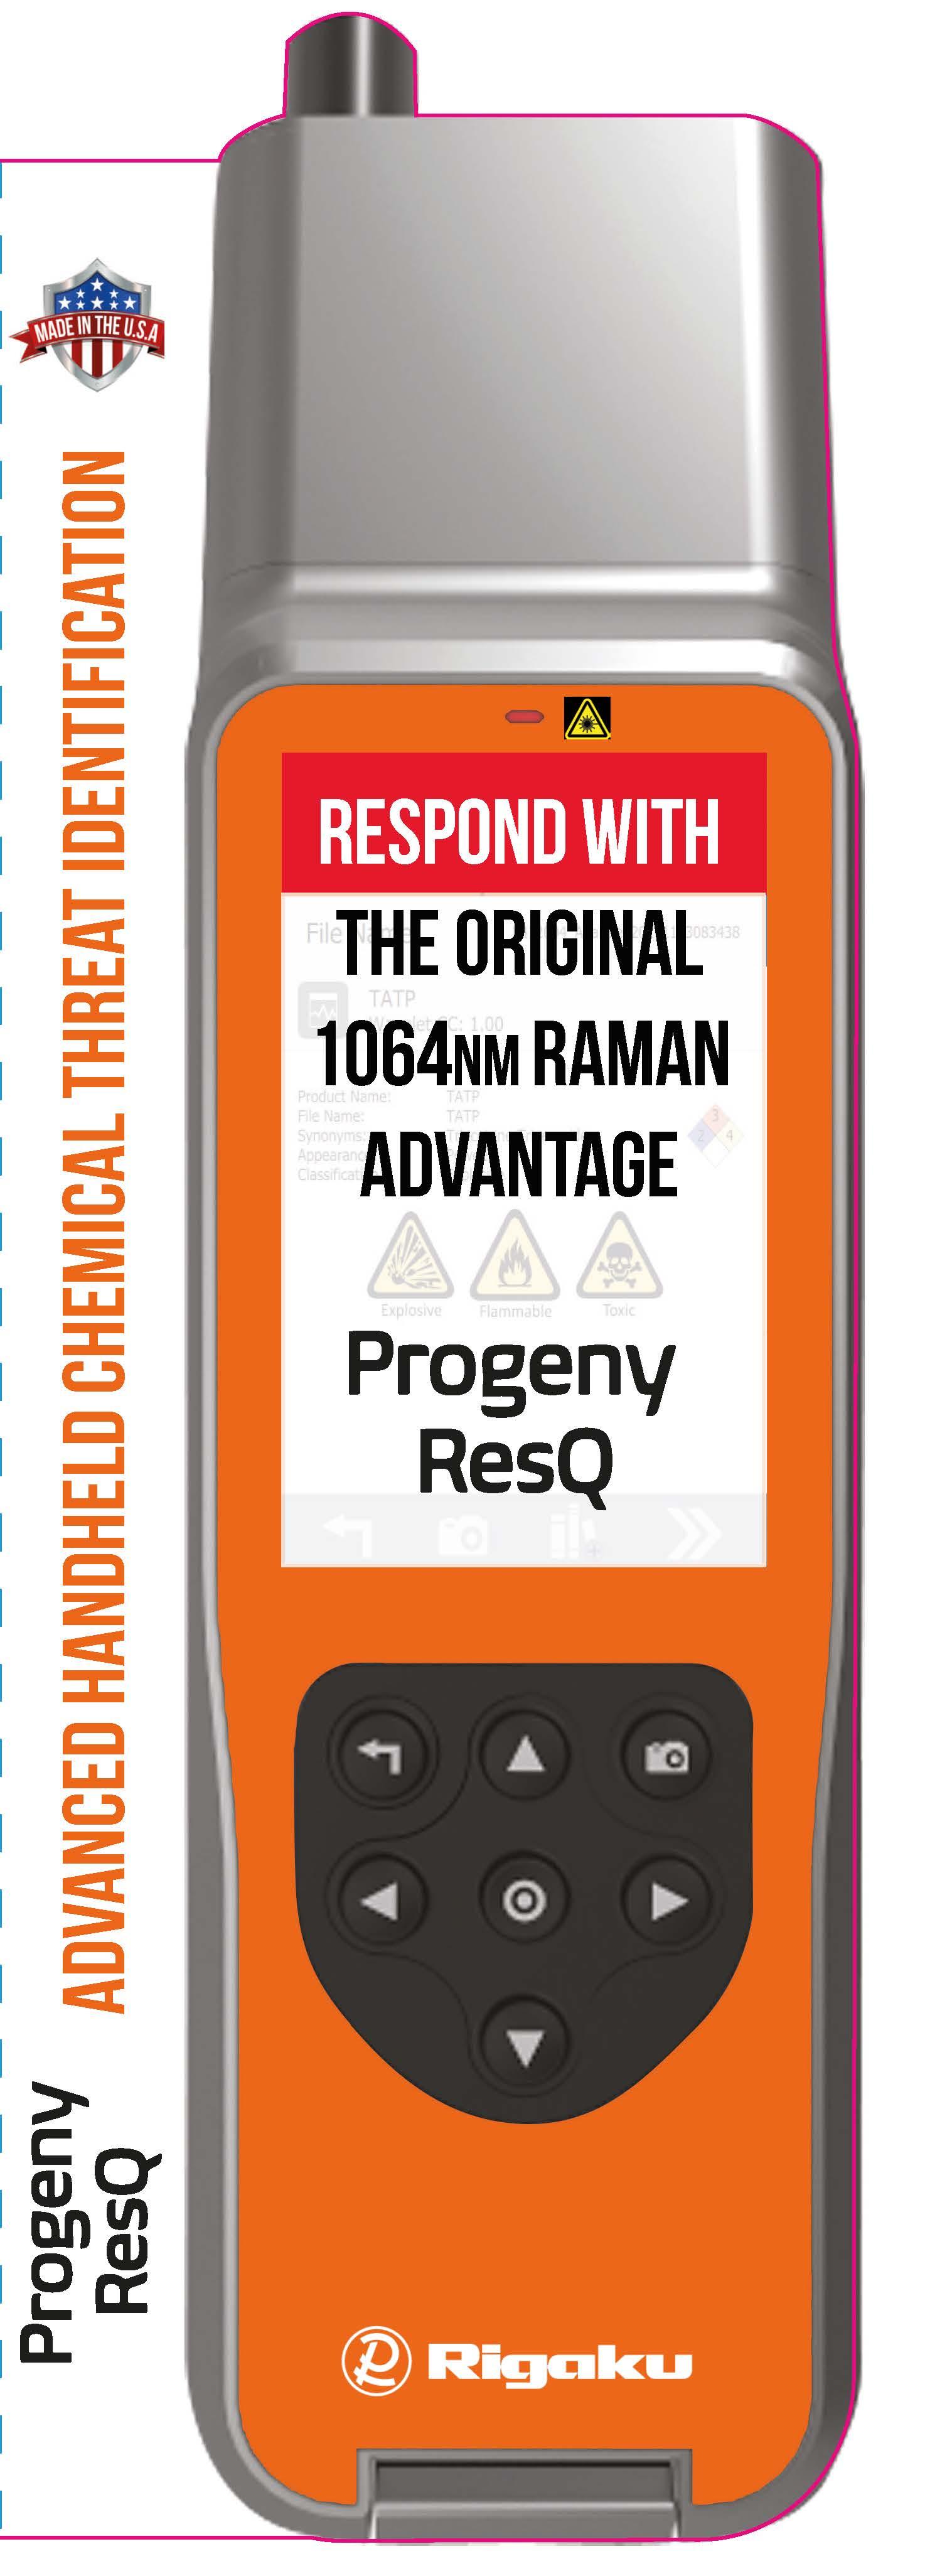 Progeny ResQ Brochure 2020Jan30_Page_1